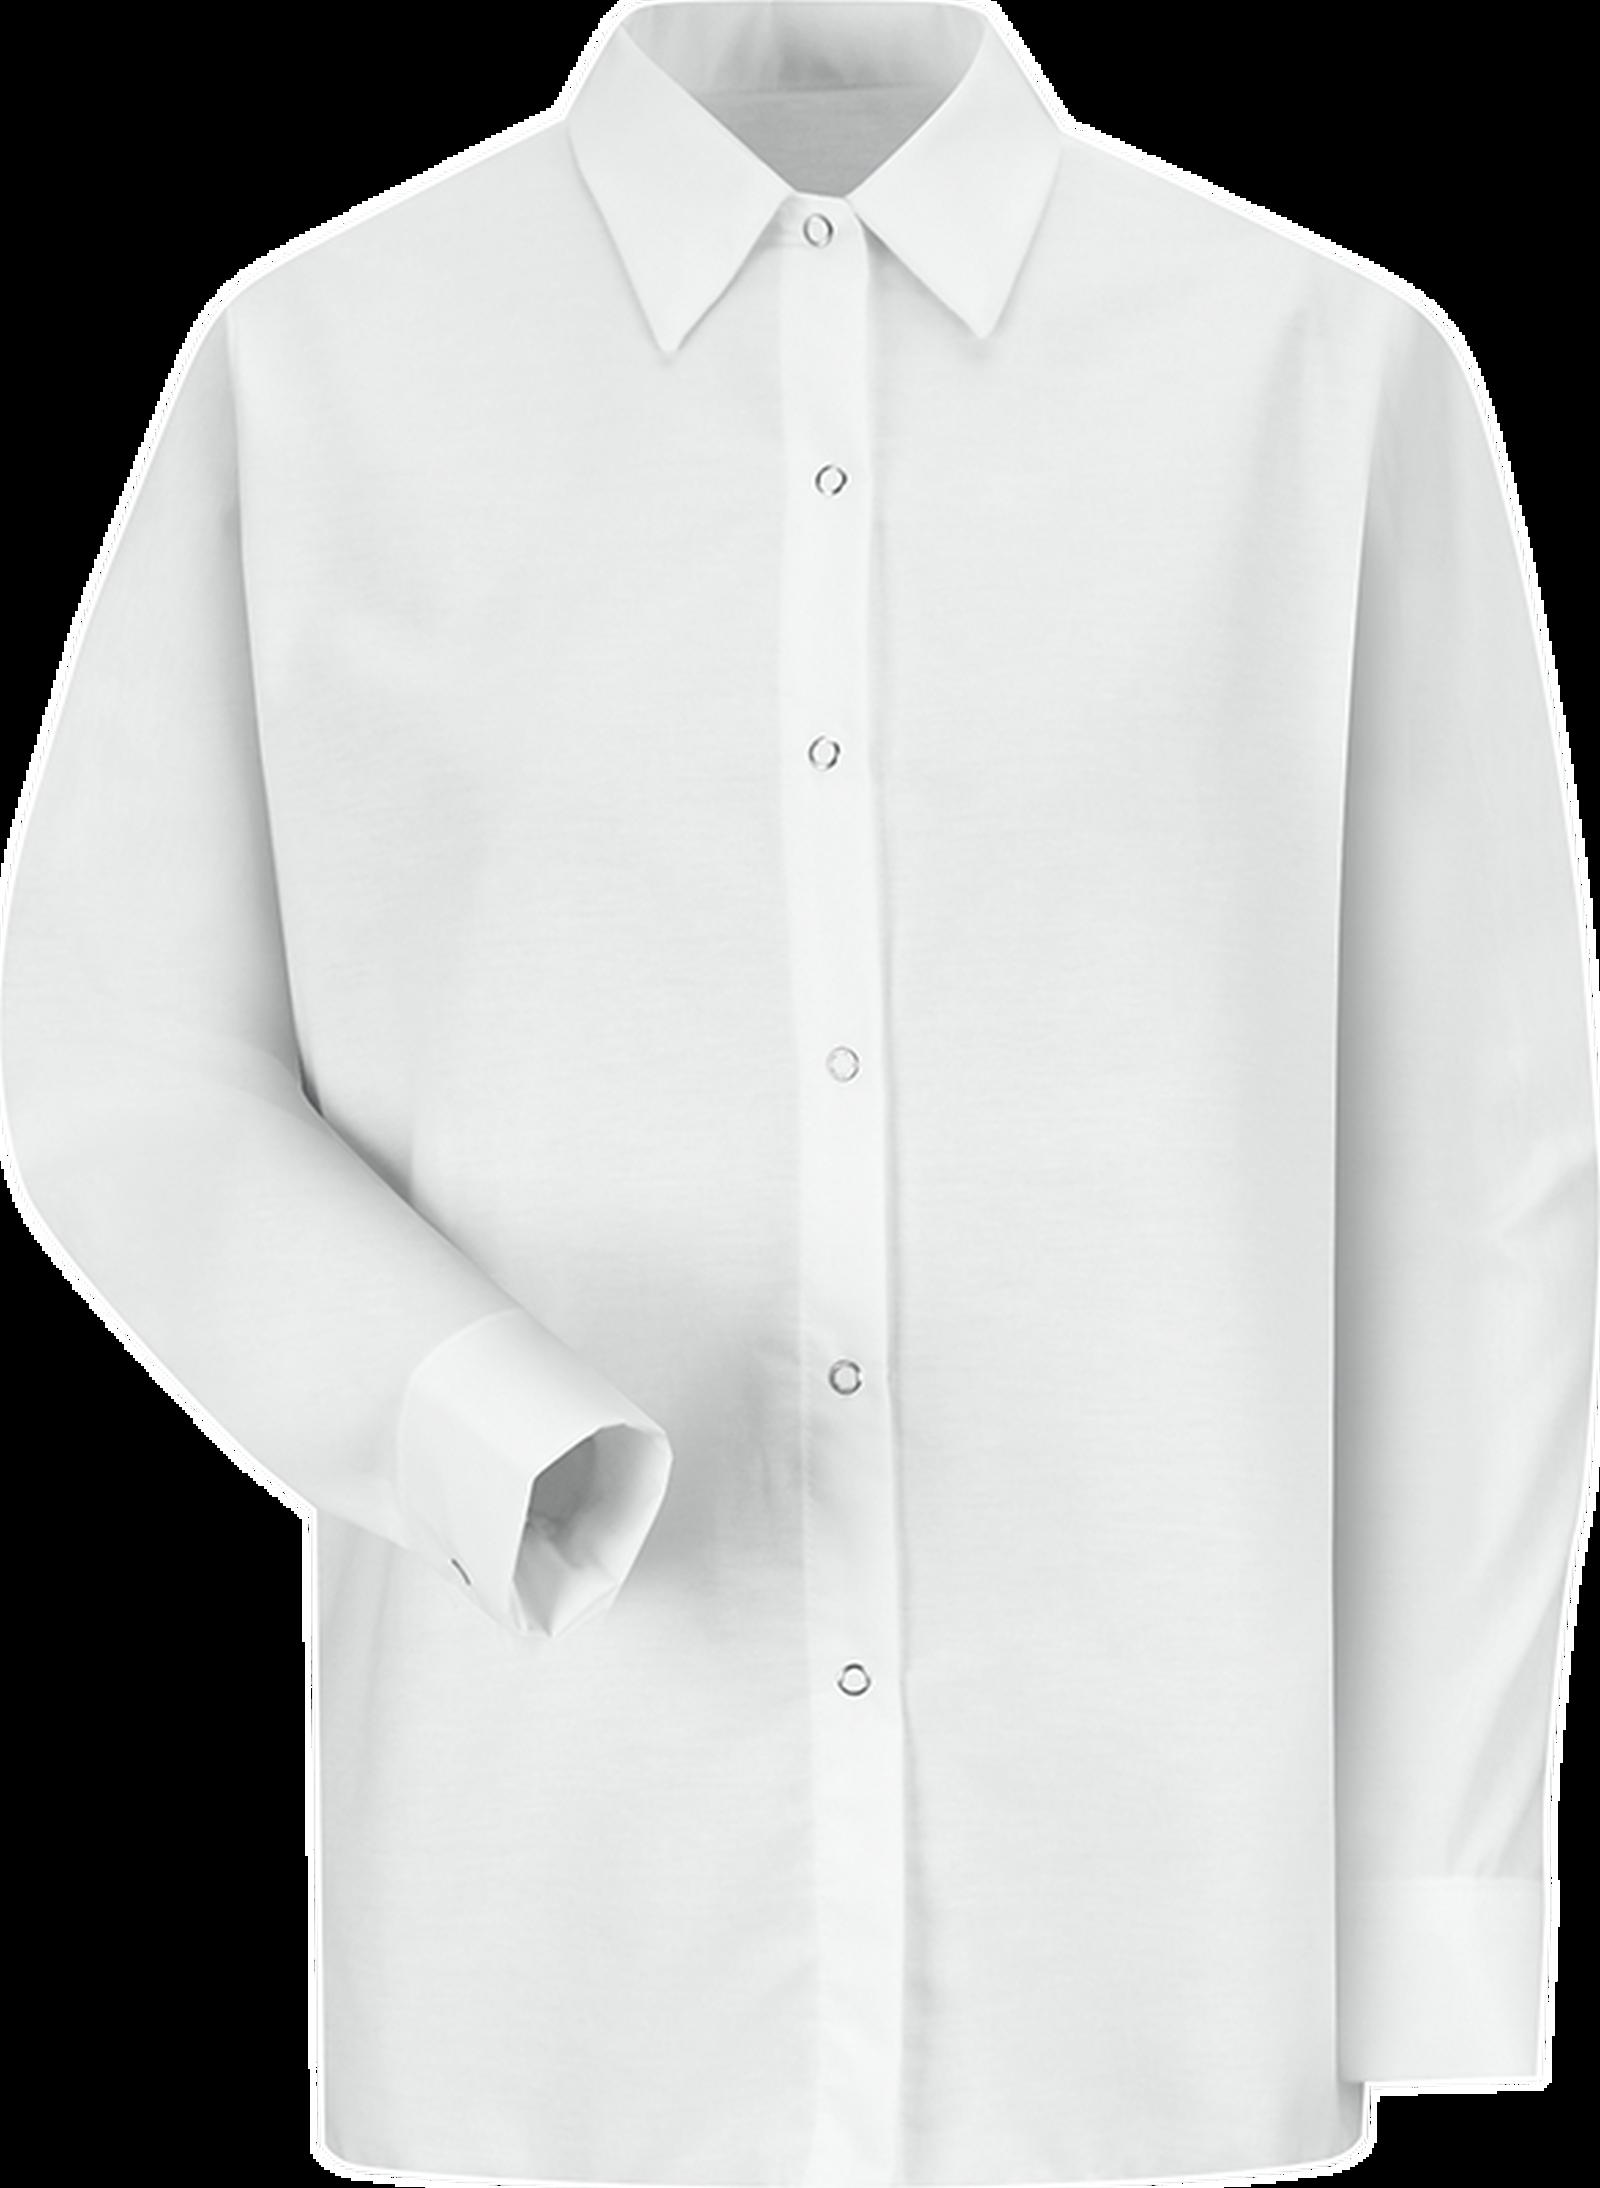 Women's Long Sleeve Specialized Pocketless Work Shirt